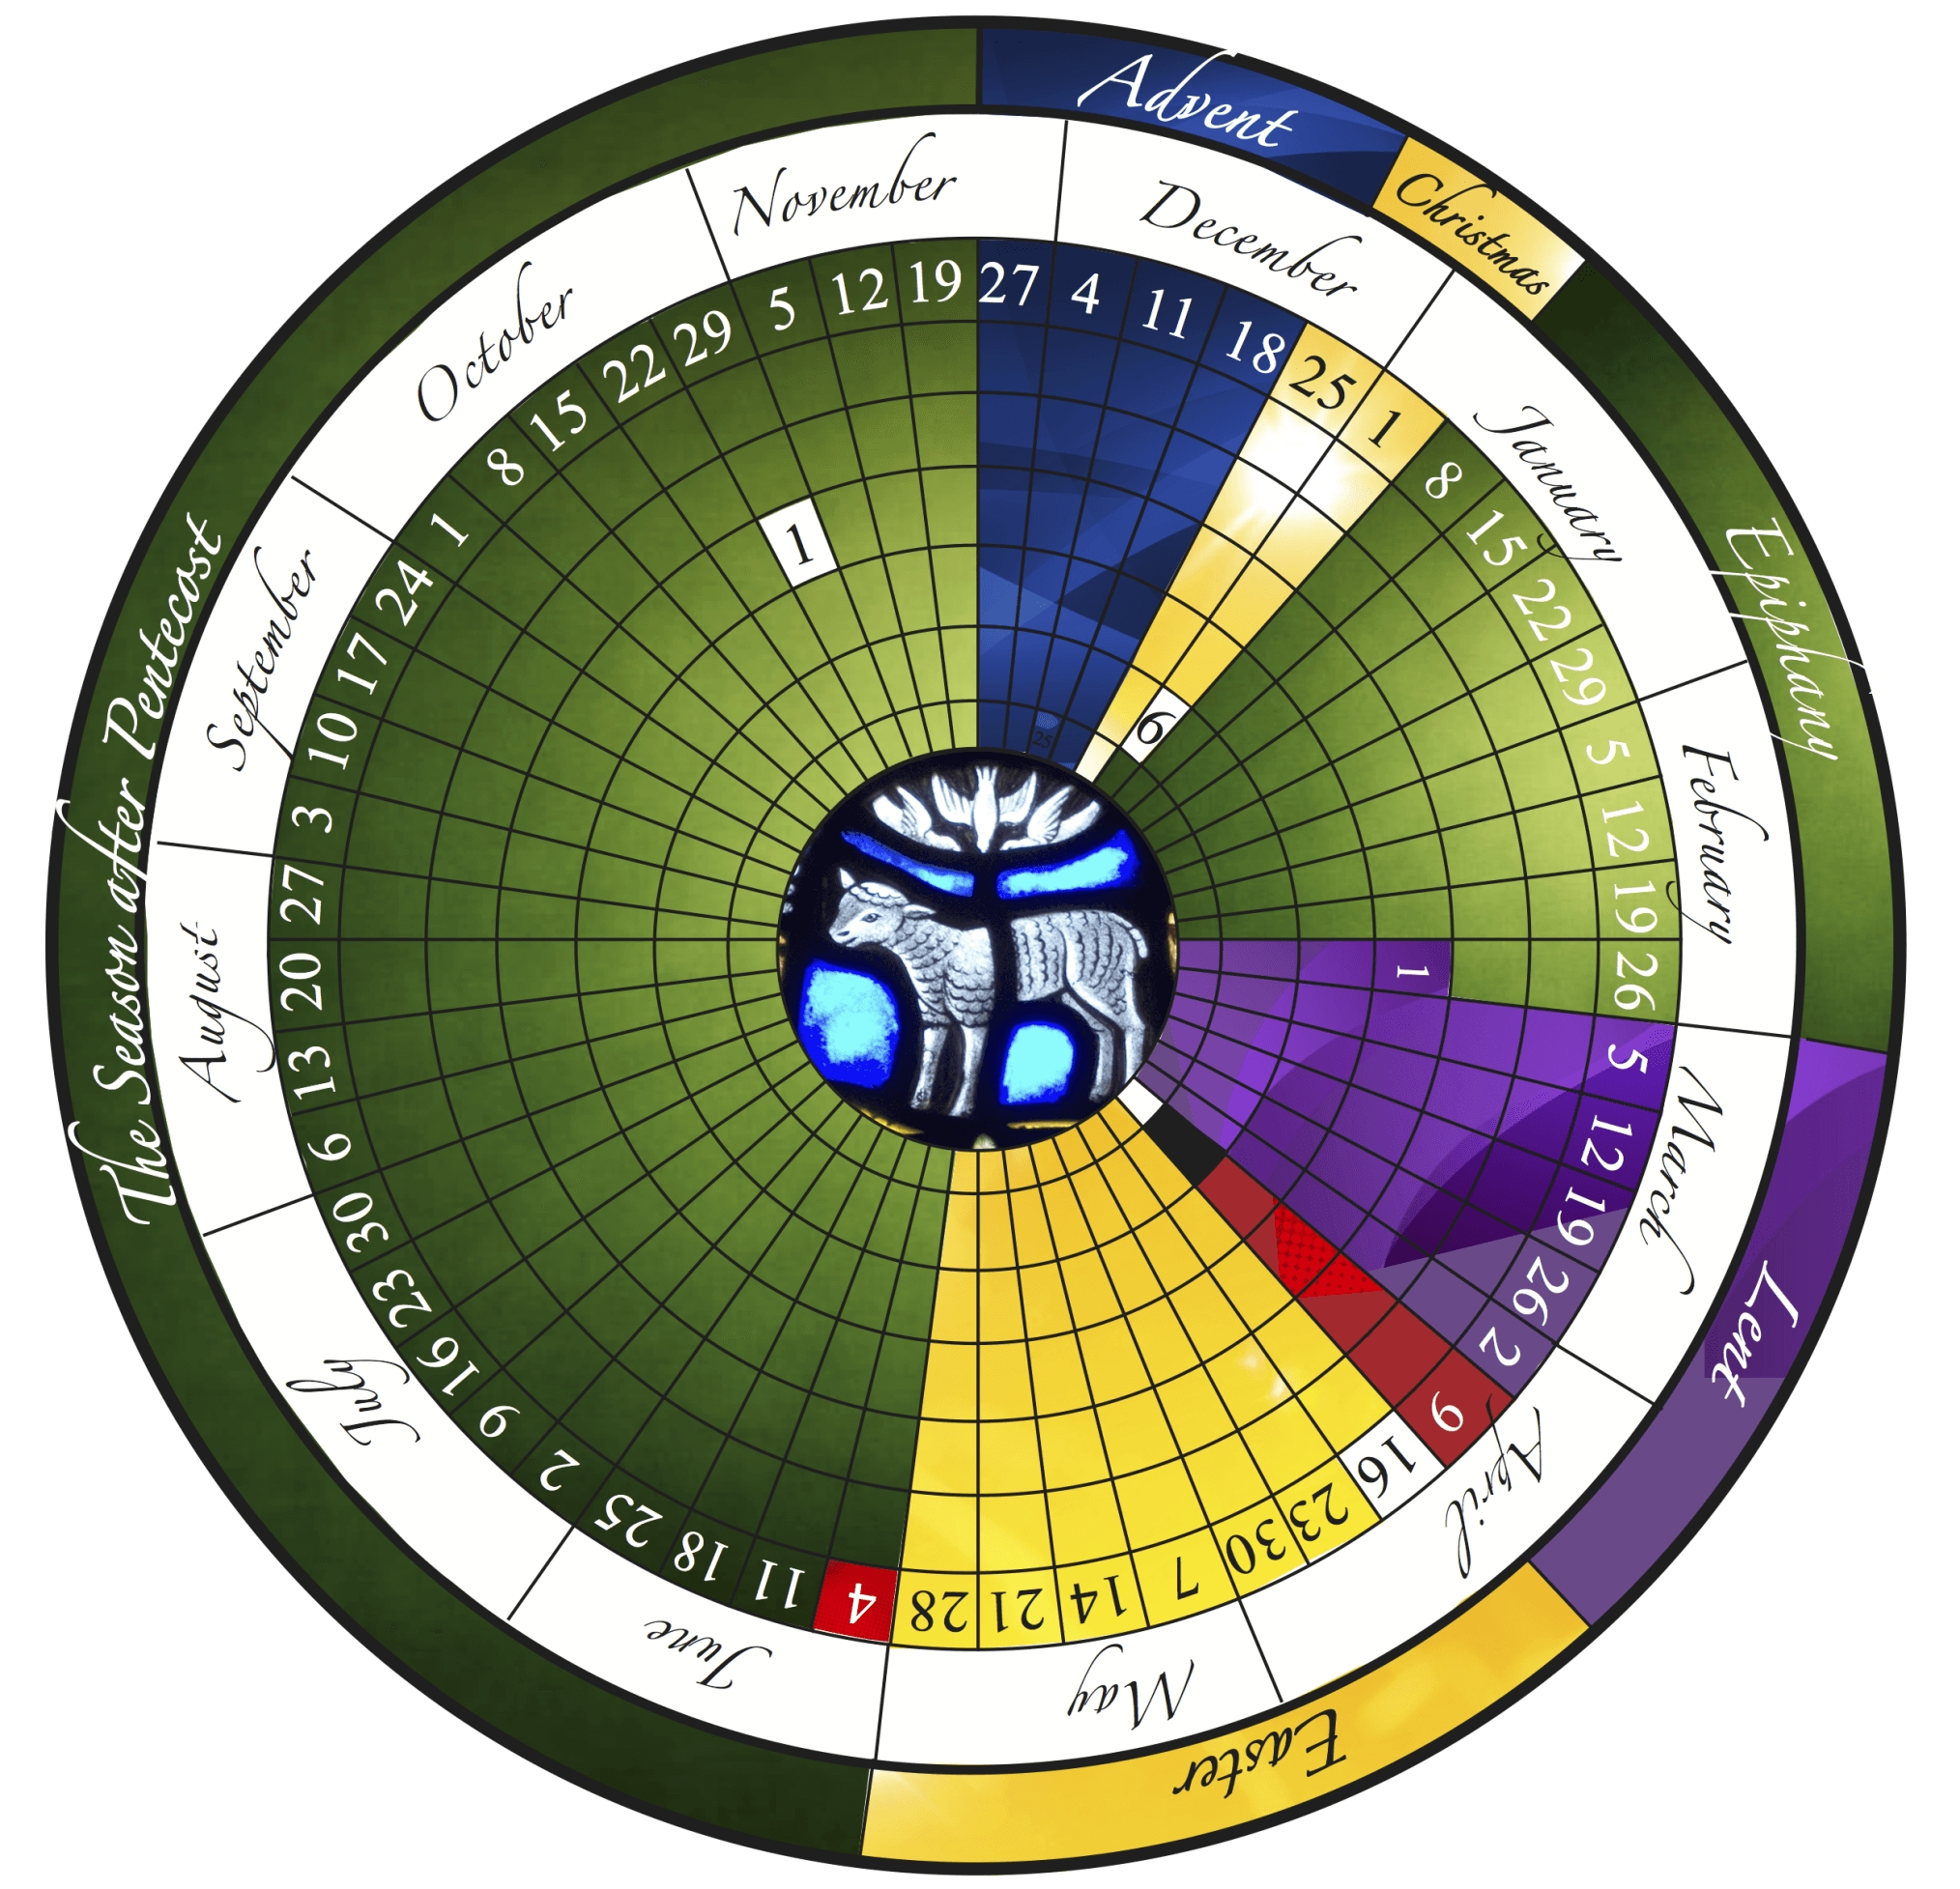 The Liturgical Year Explained (Plus Free Printable Calendar!) regarding Printable Year A Liturgical Calendar 2020